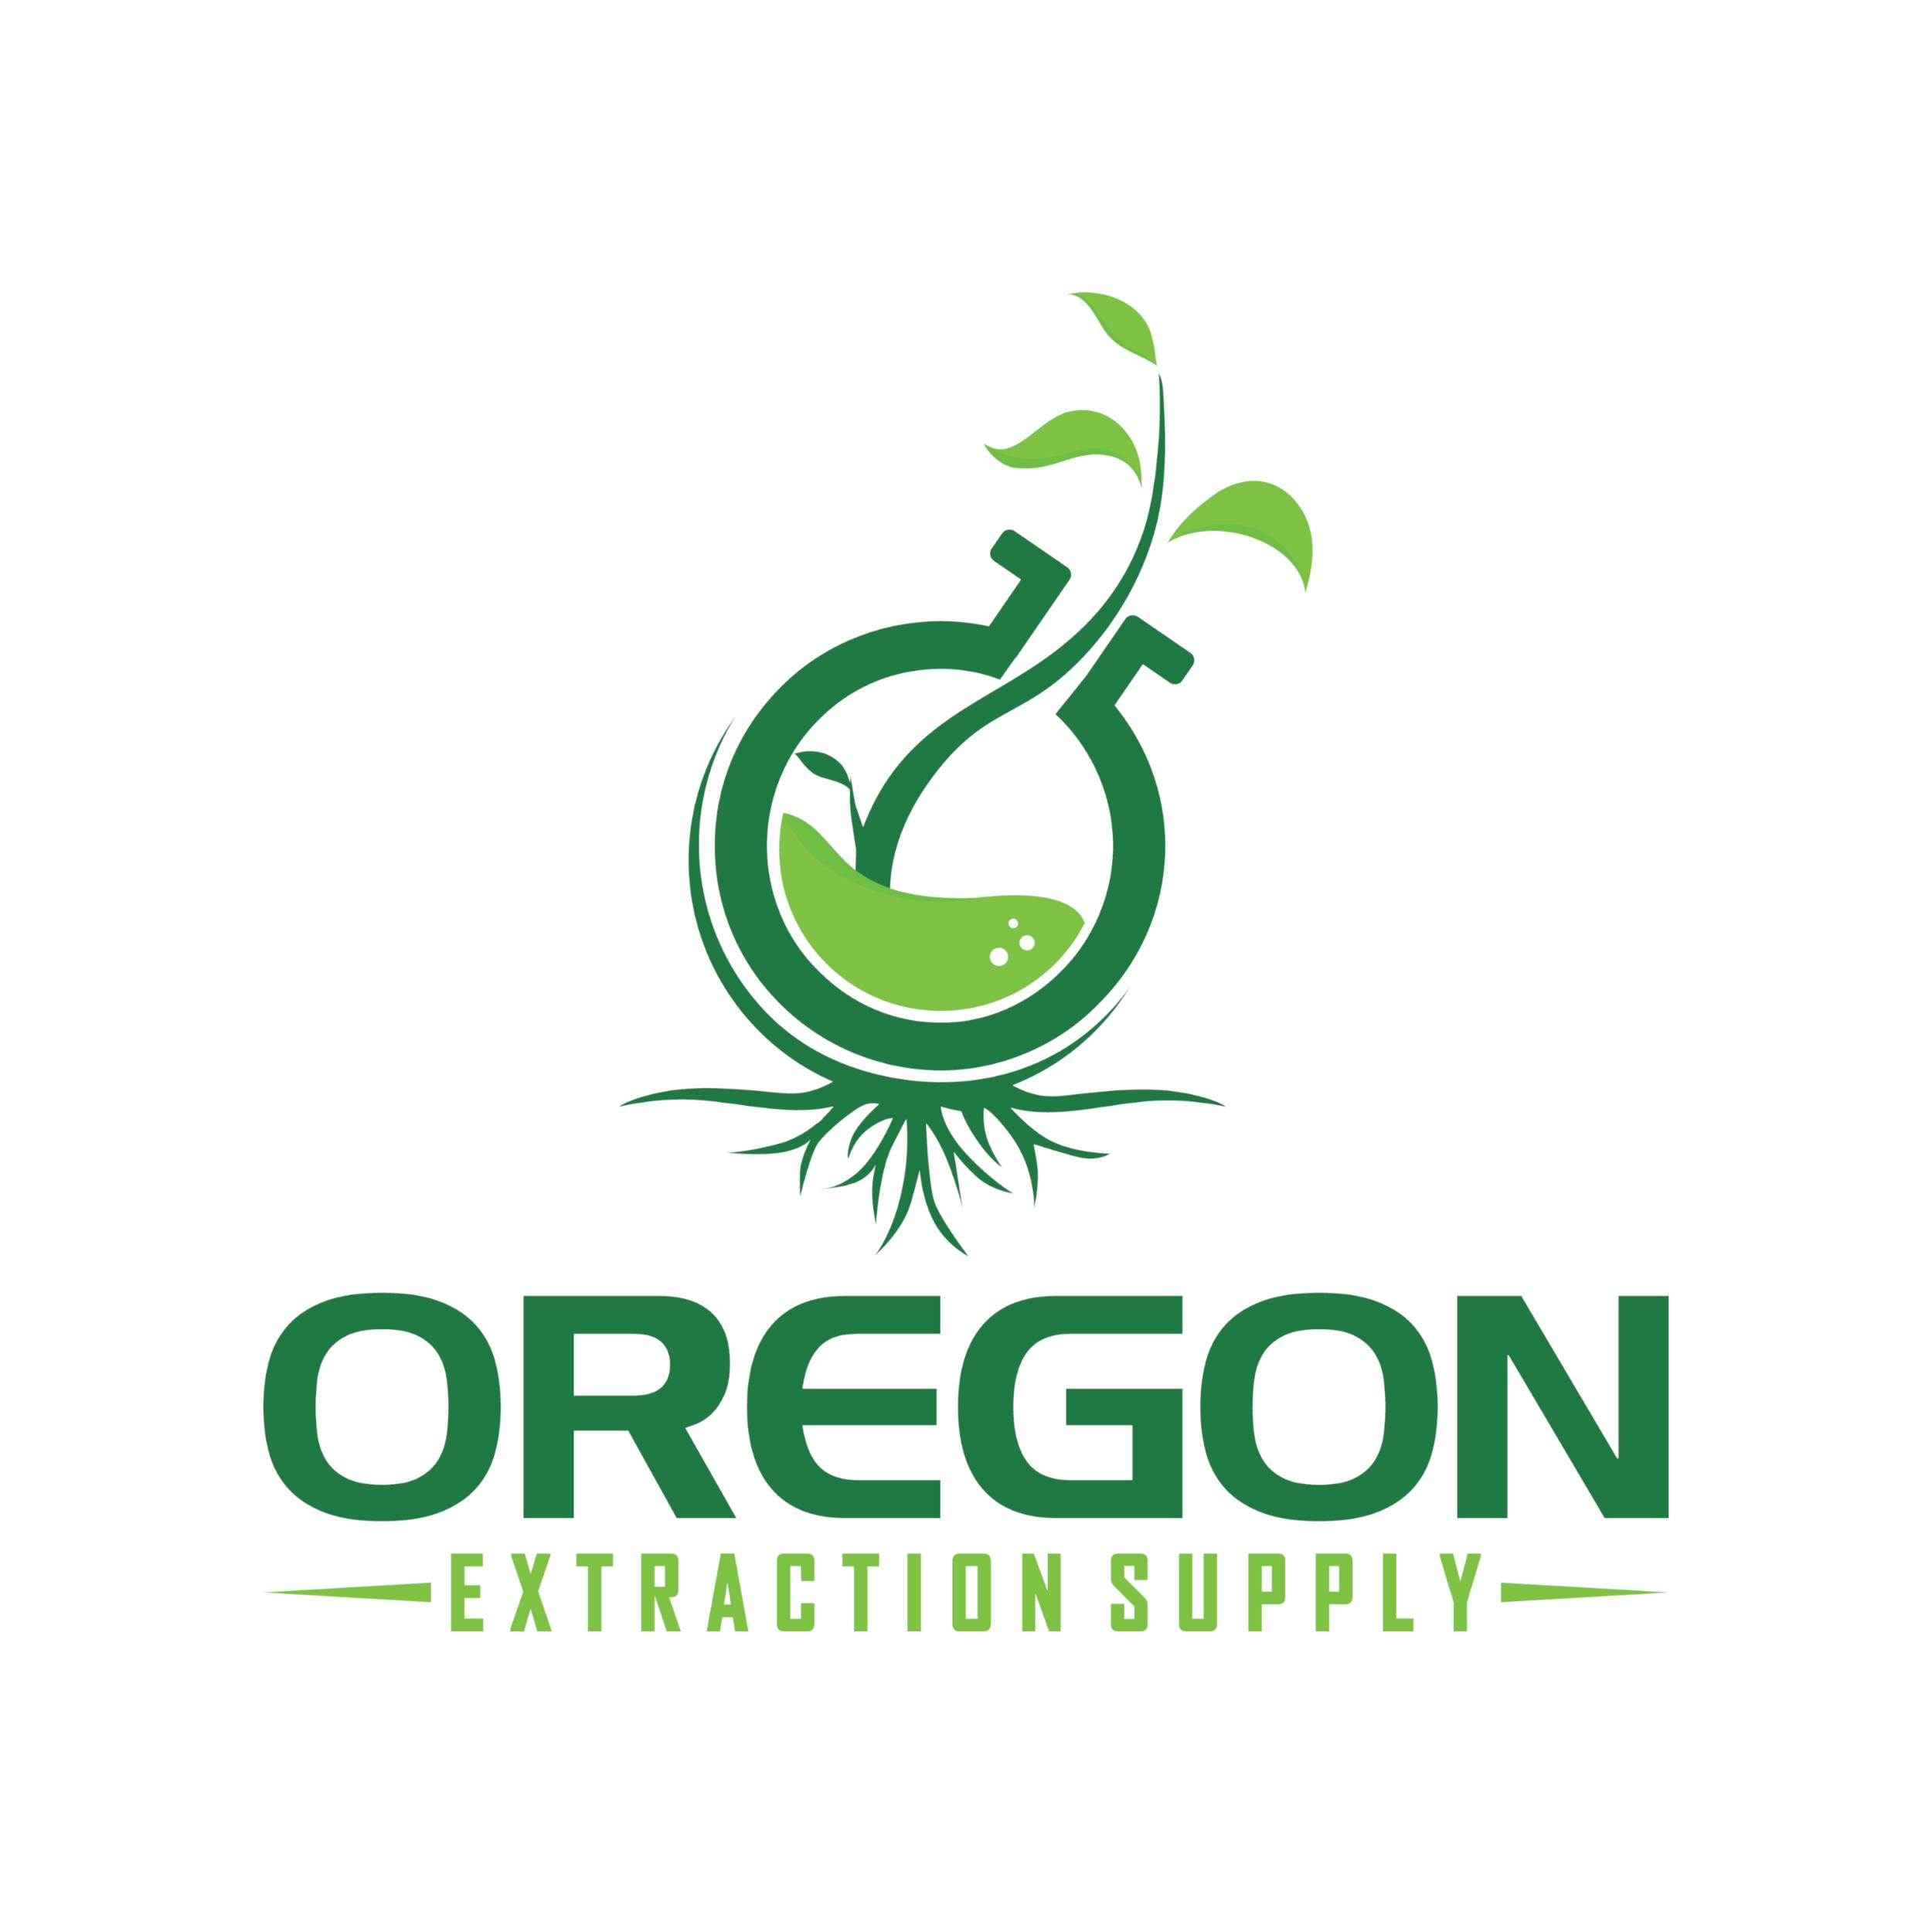 OregonExtraction.png